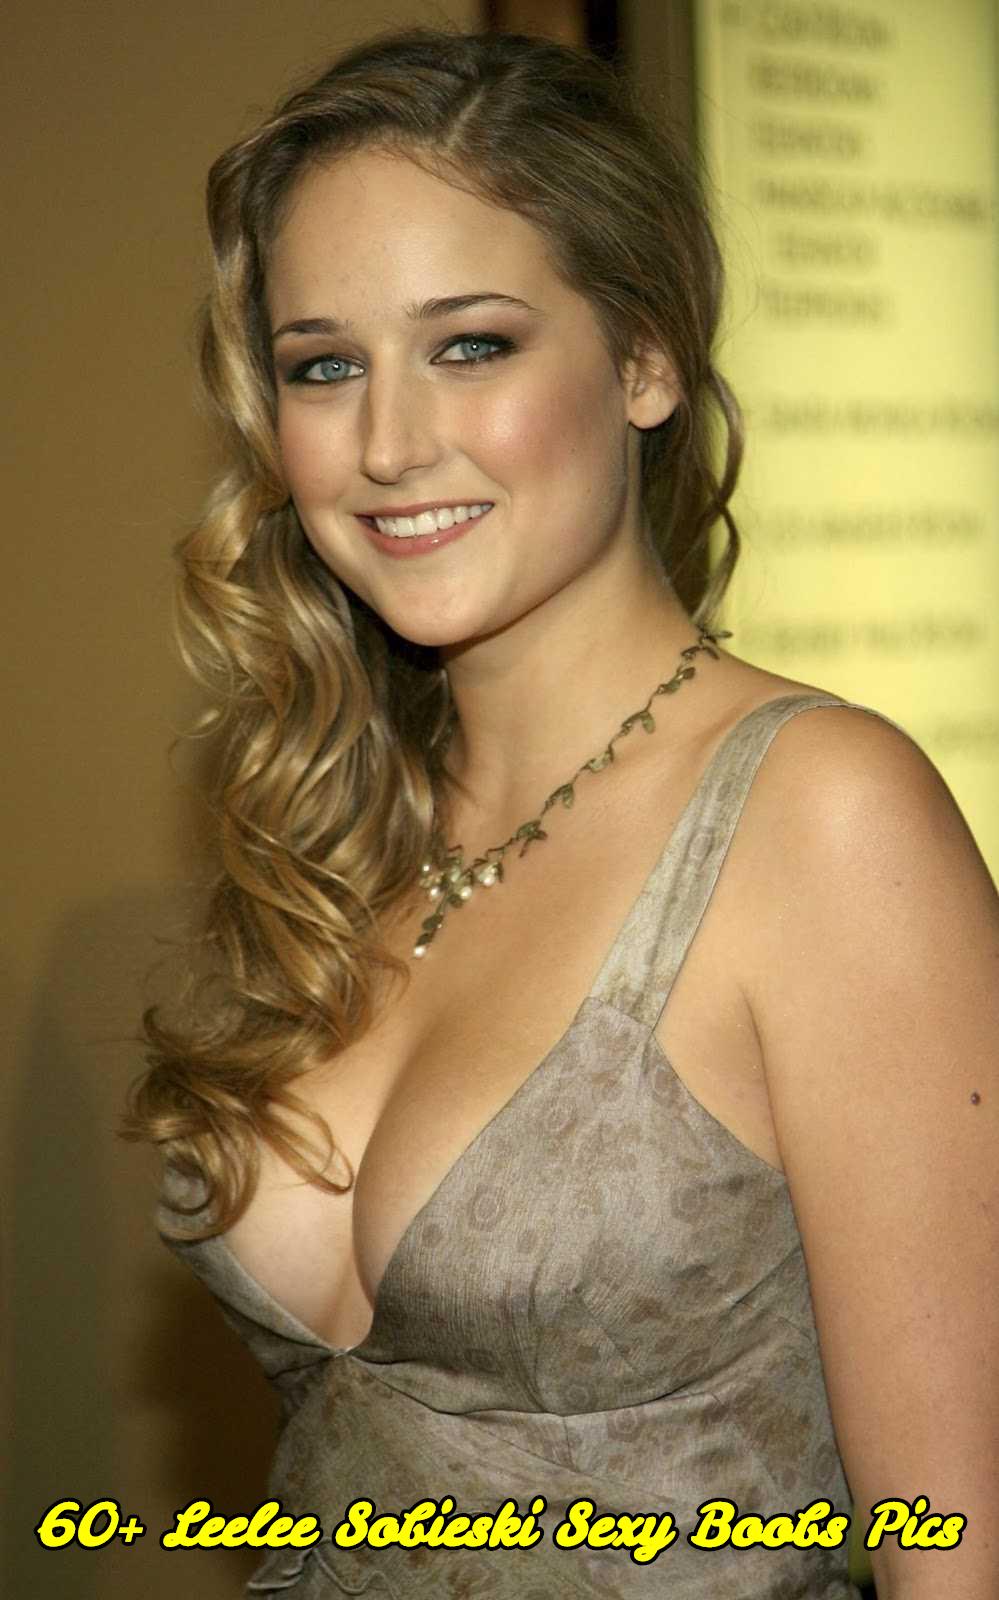 Leelee Sobieski sexy boobs pics